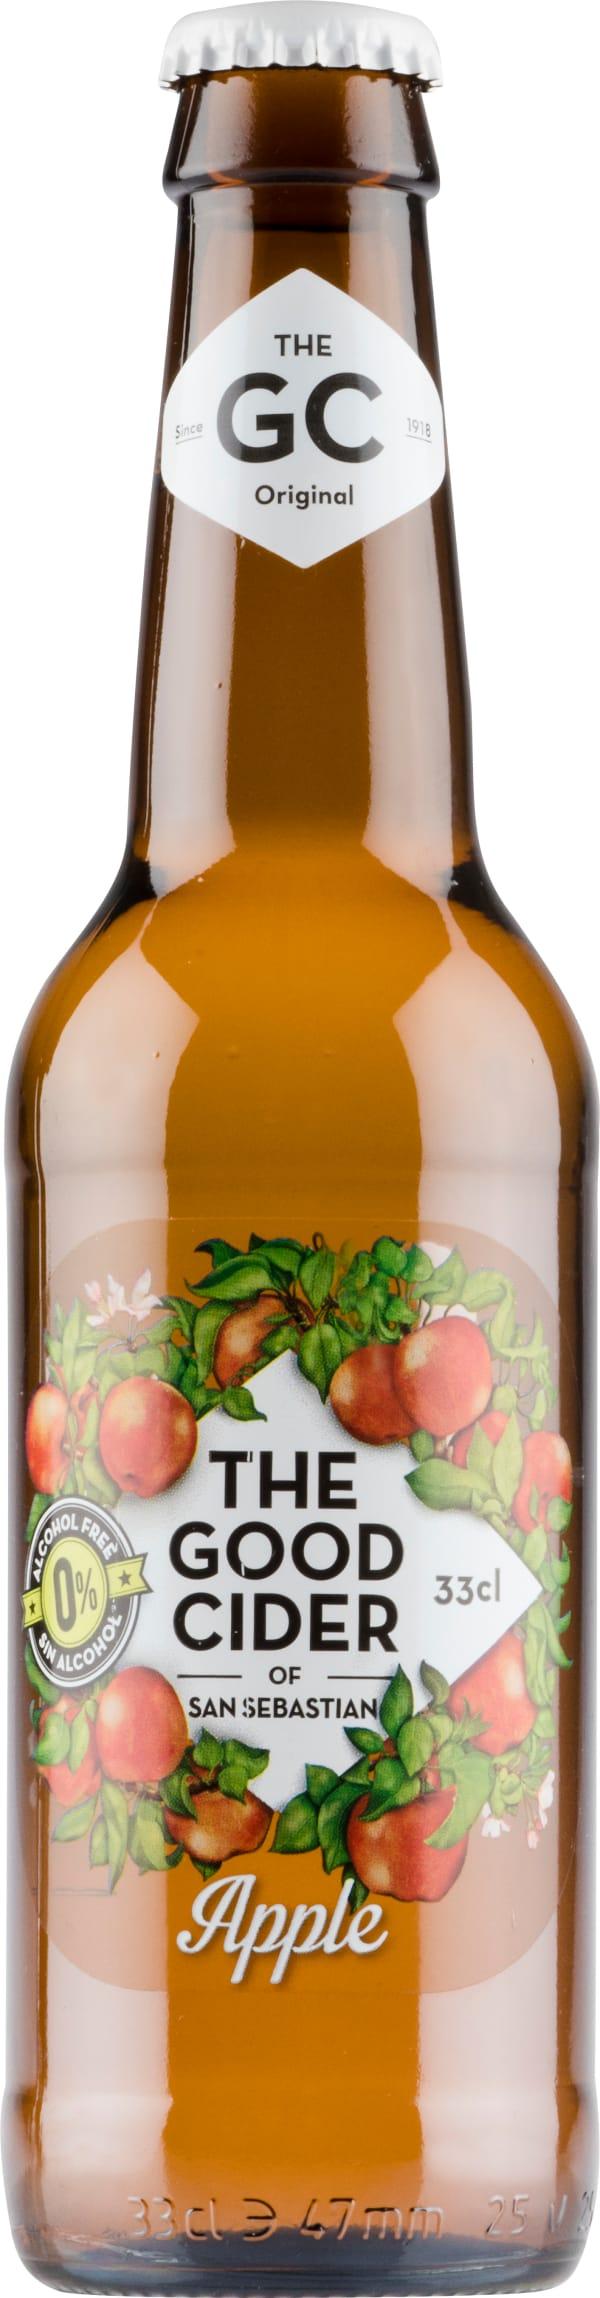 The Good Cider of San Sebastian Apple